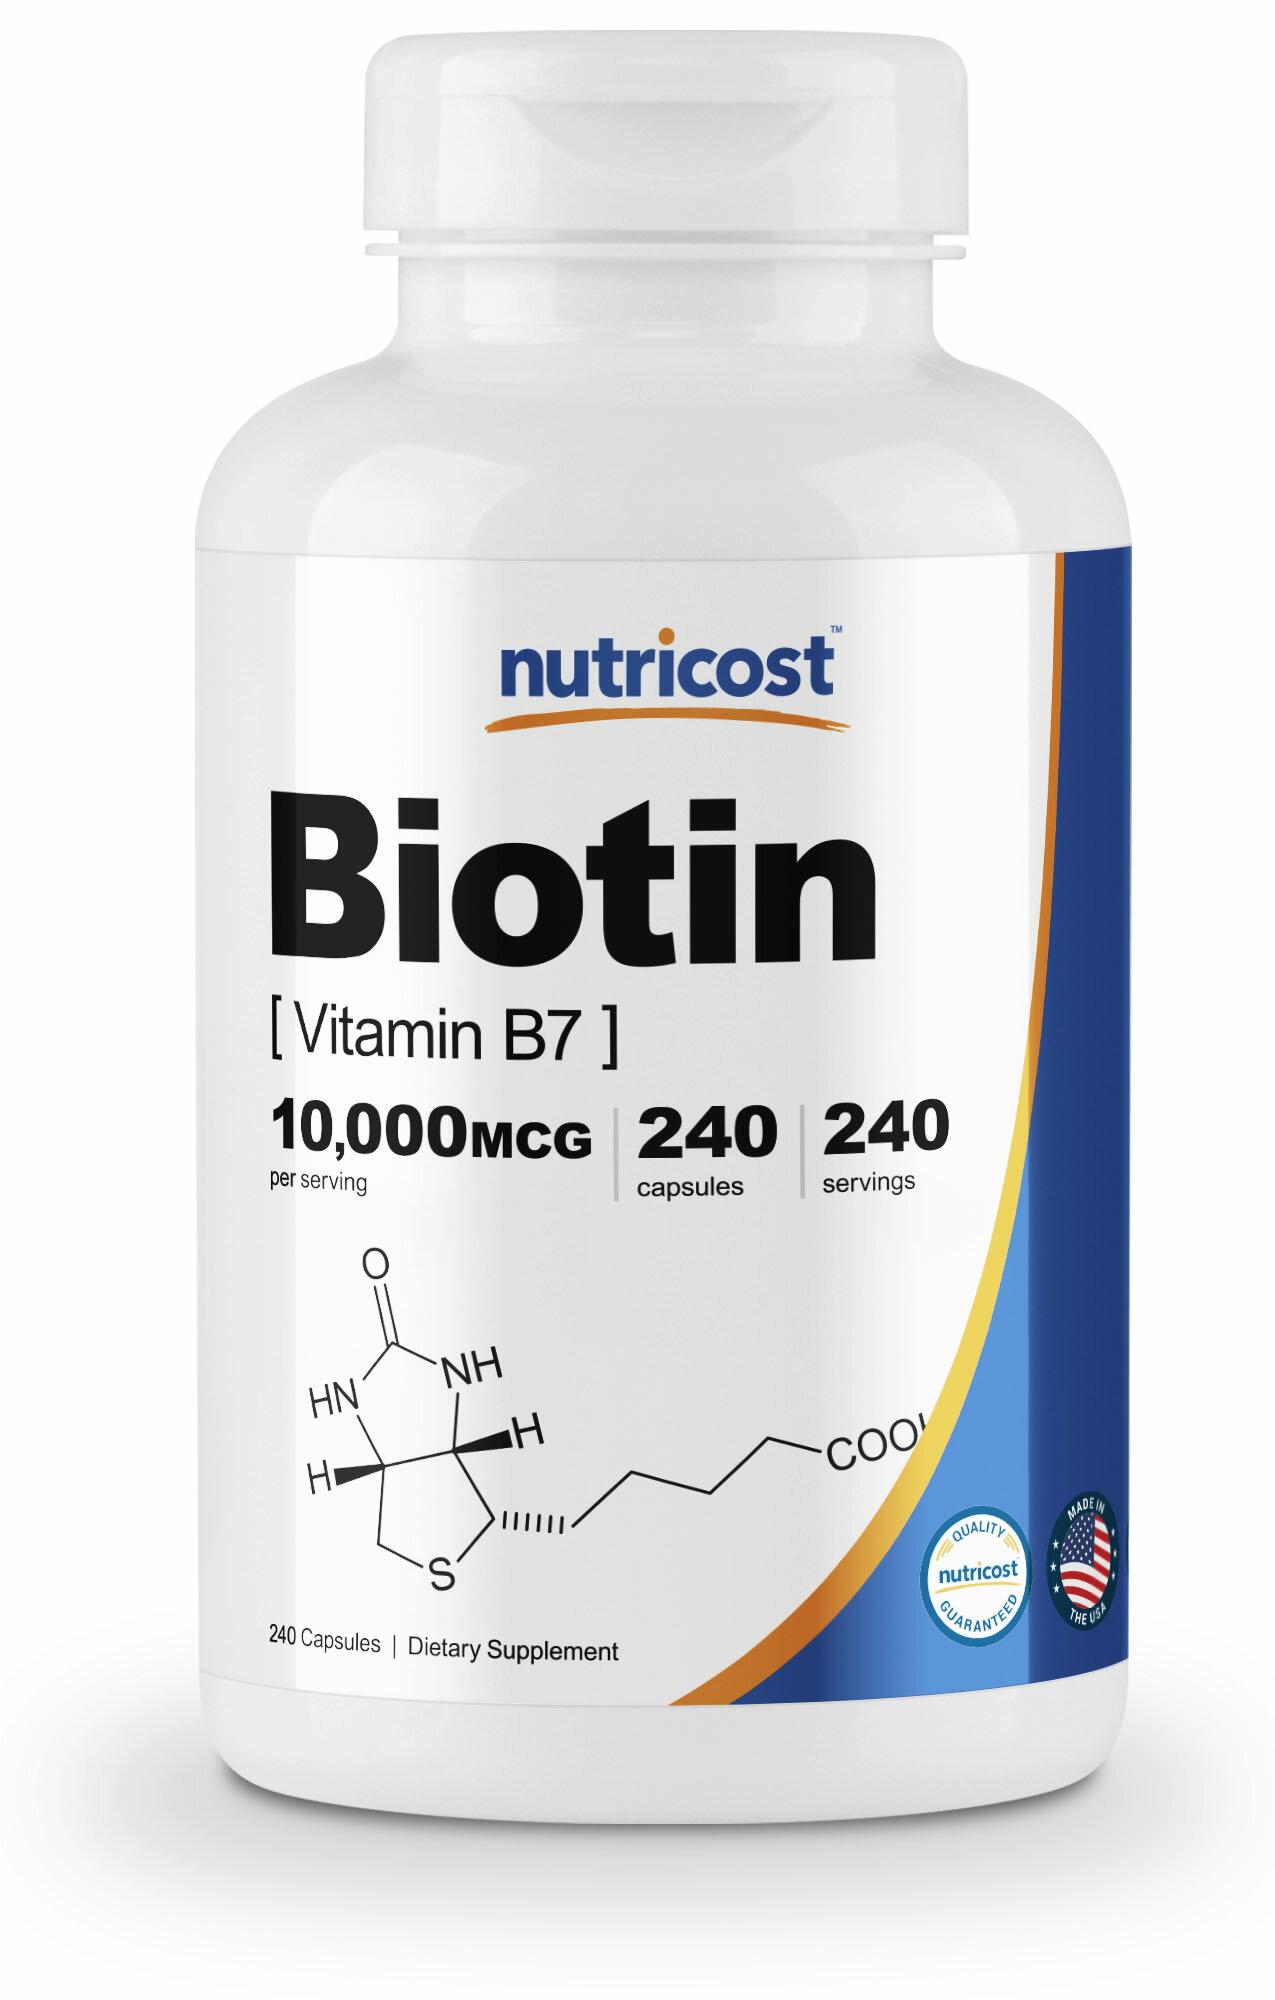 Esupplements Nutricost Biotin Vitamin B7 10000mcg 10mg 240 10000 Mcg 100 Tablets Natrol Capsules Gluten